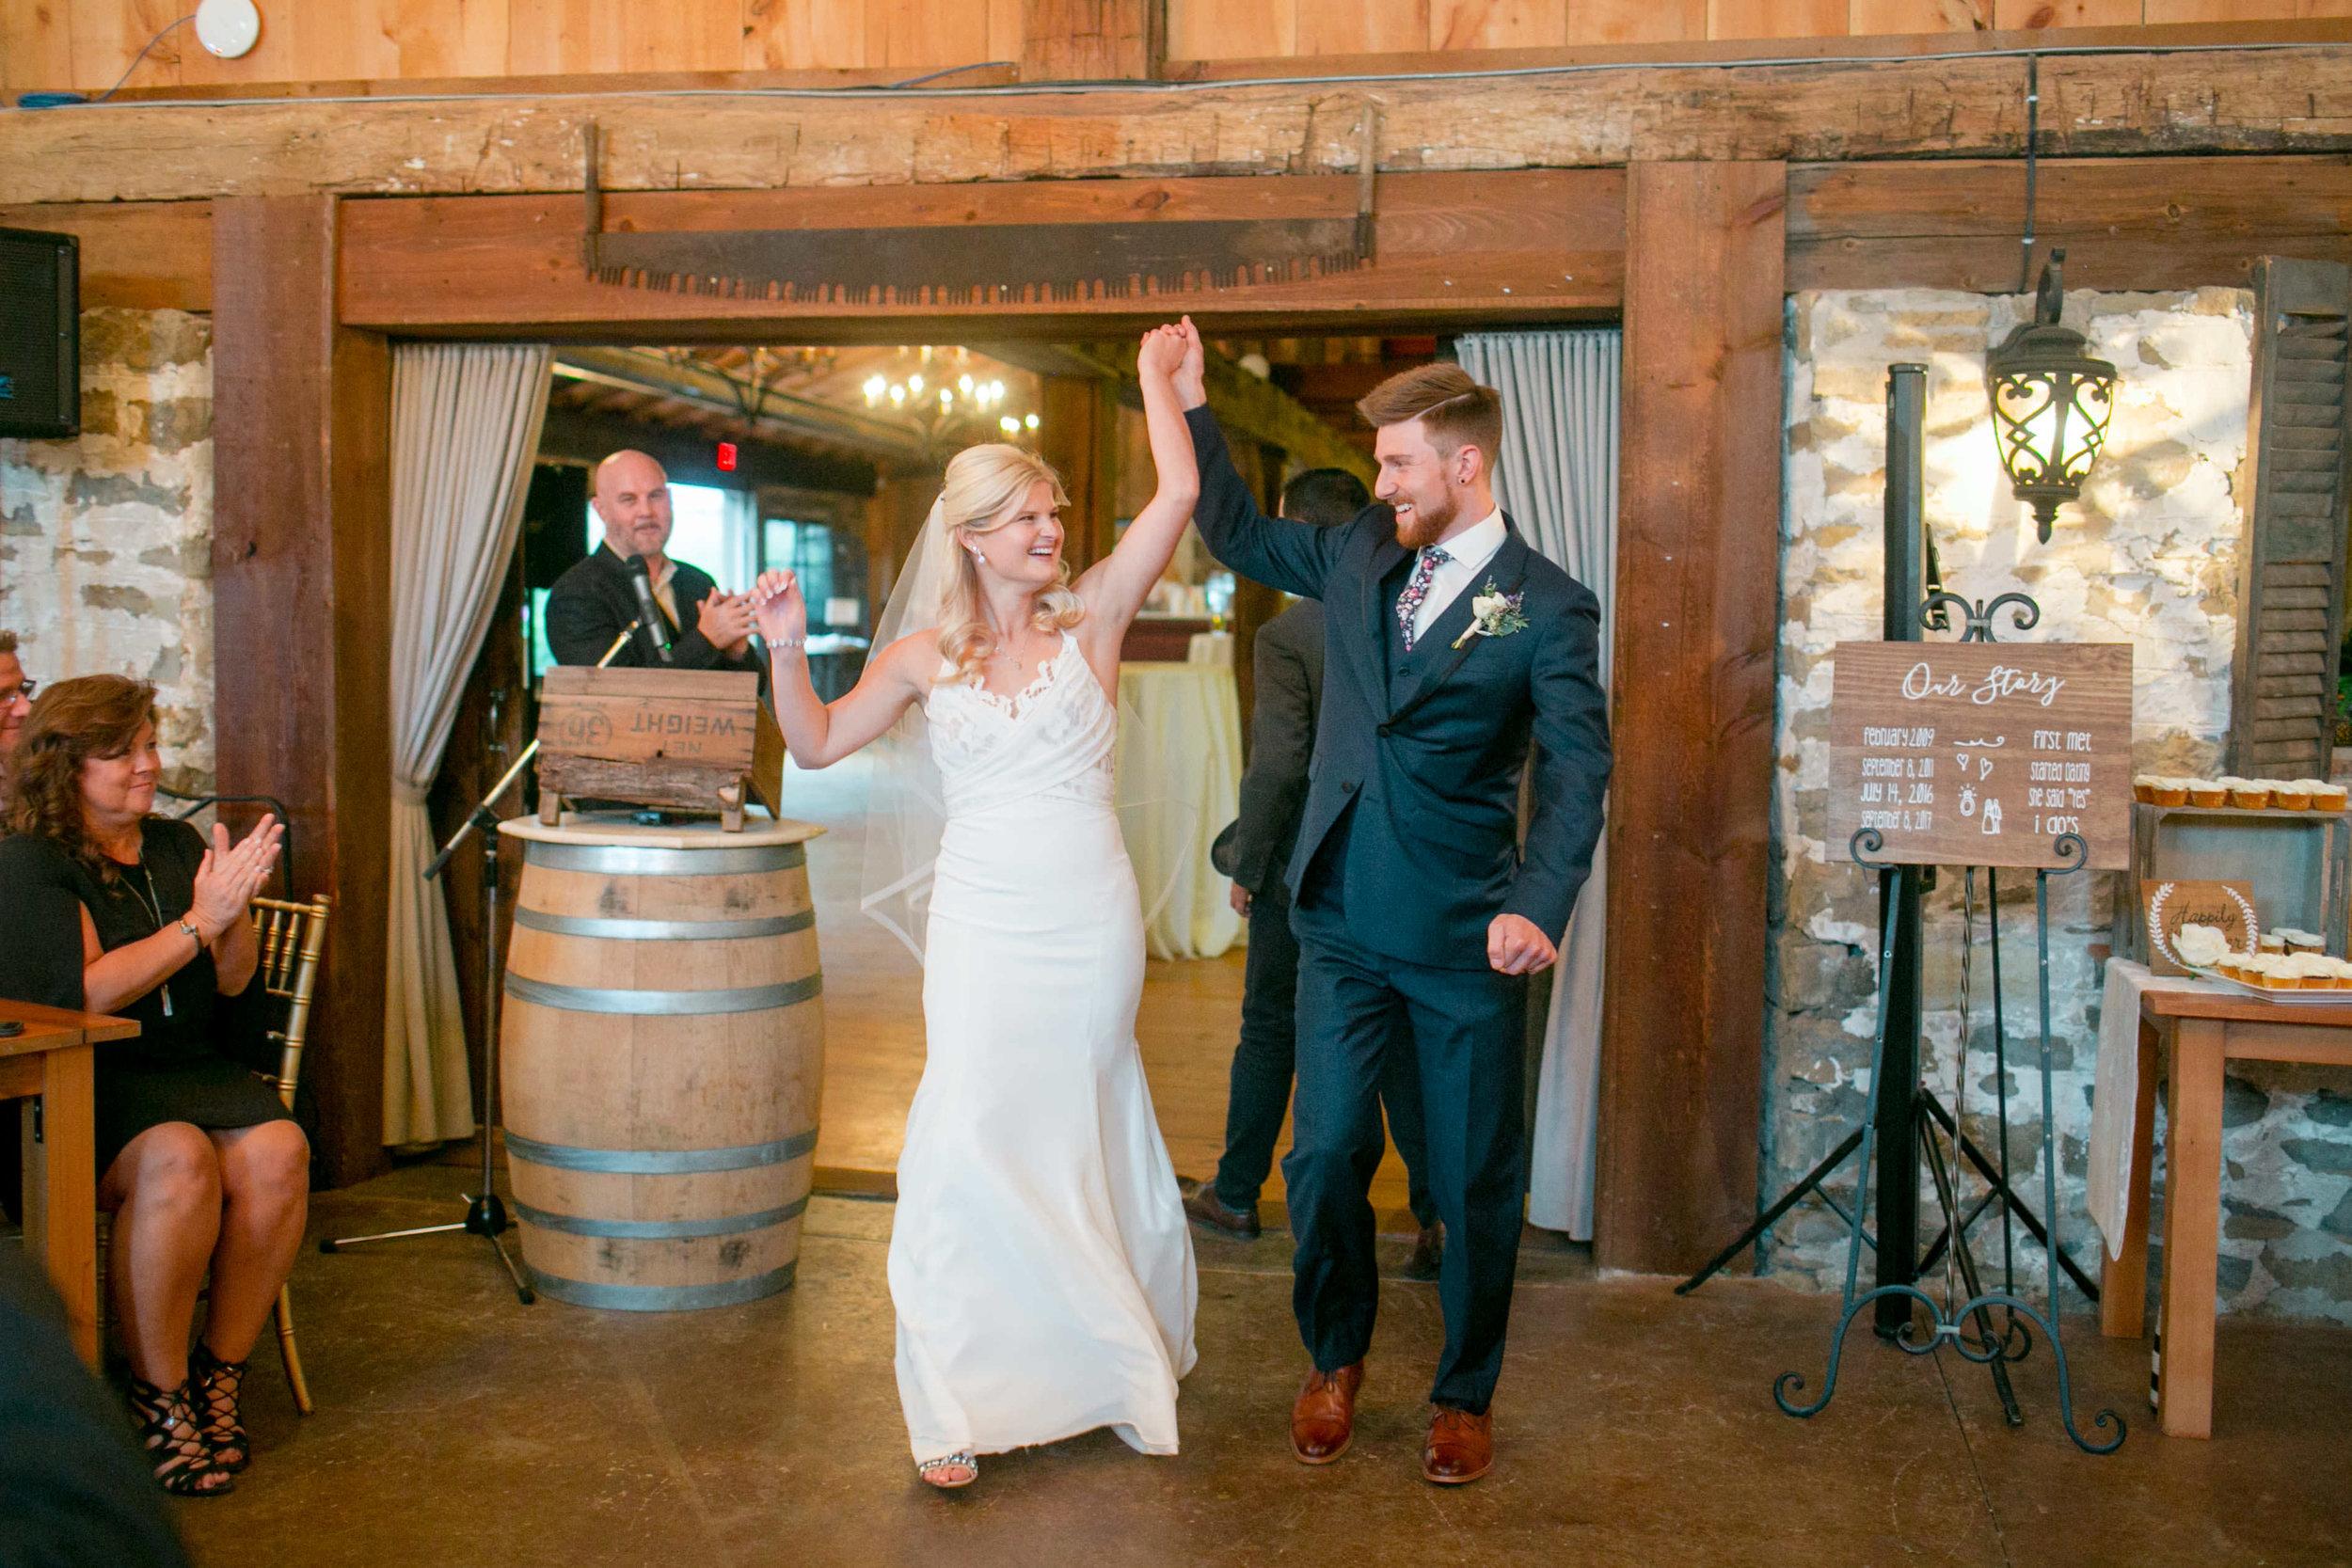 Maddy___Brandon___Daniel_Ricci_Weddings_High_Res._Finals_514.jpg